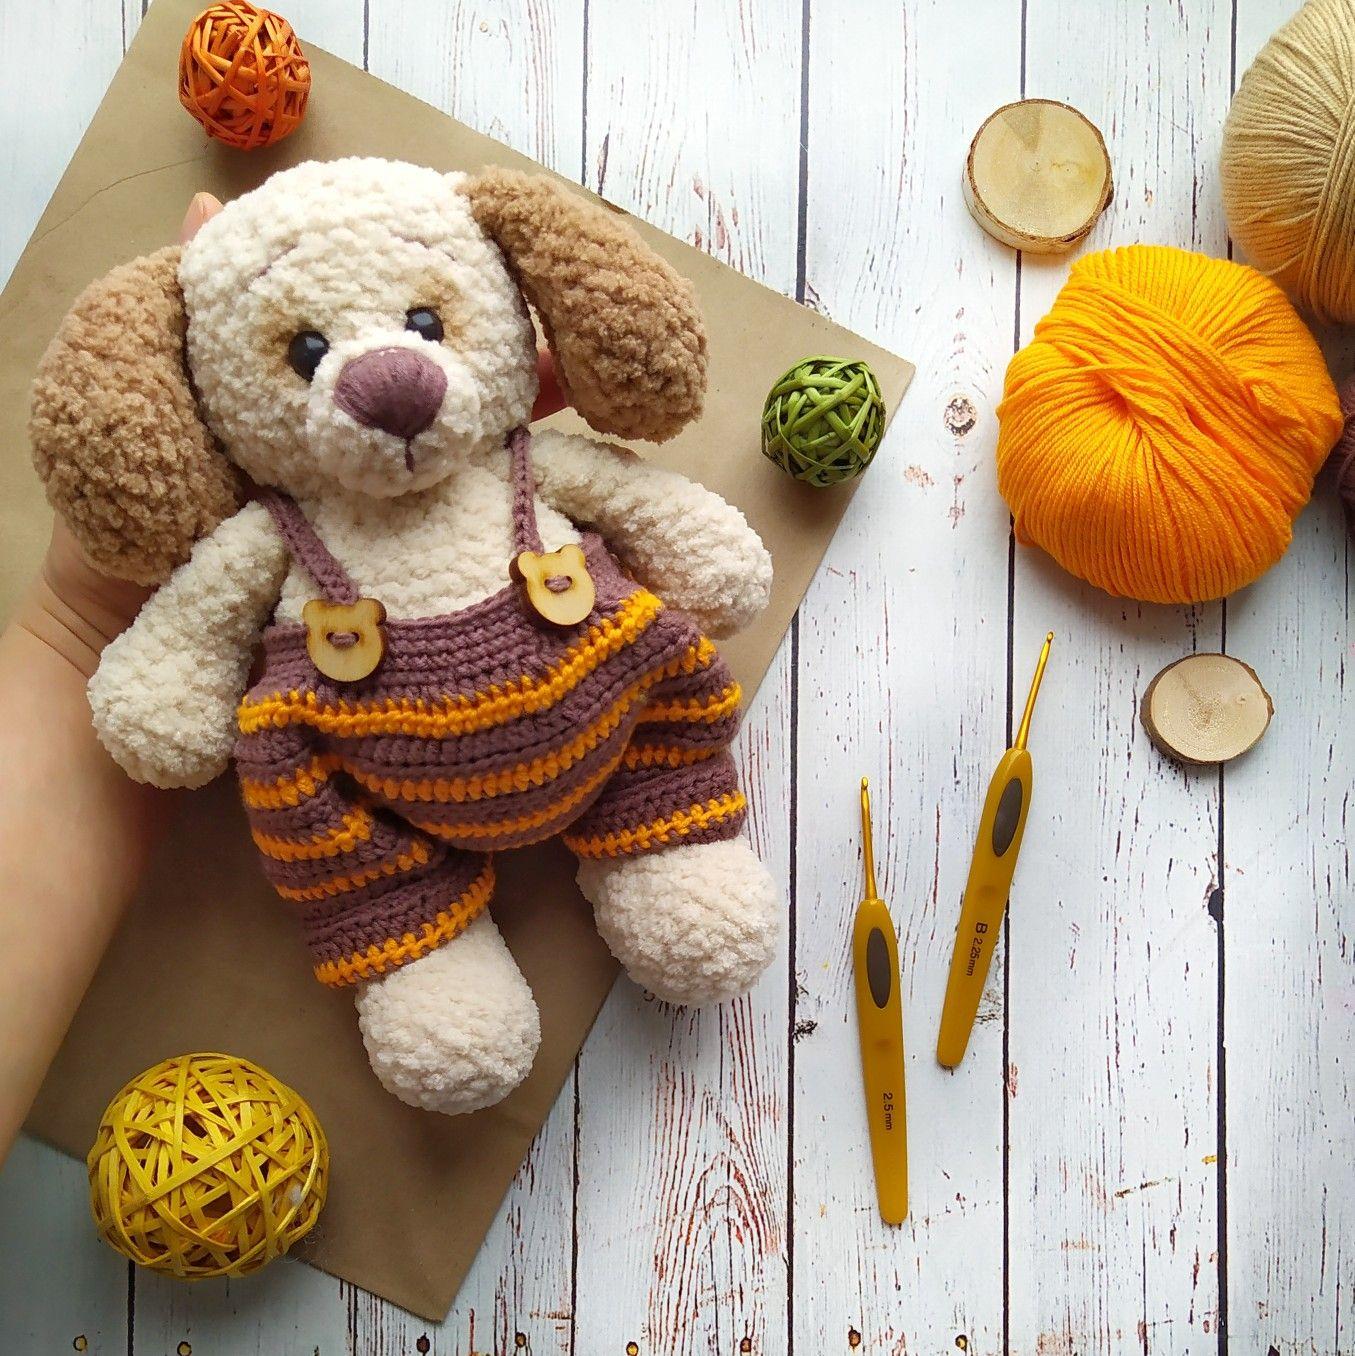 Plush Beige Teddy Dog Crochet Dog Stuffed Toy Etsy Crochet Teddy Bear Pattern Crochet Dog Patterns Crochet Teddy Bear [ 1356 x 1355 Pixel ]